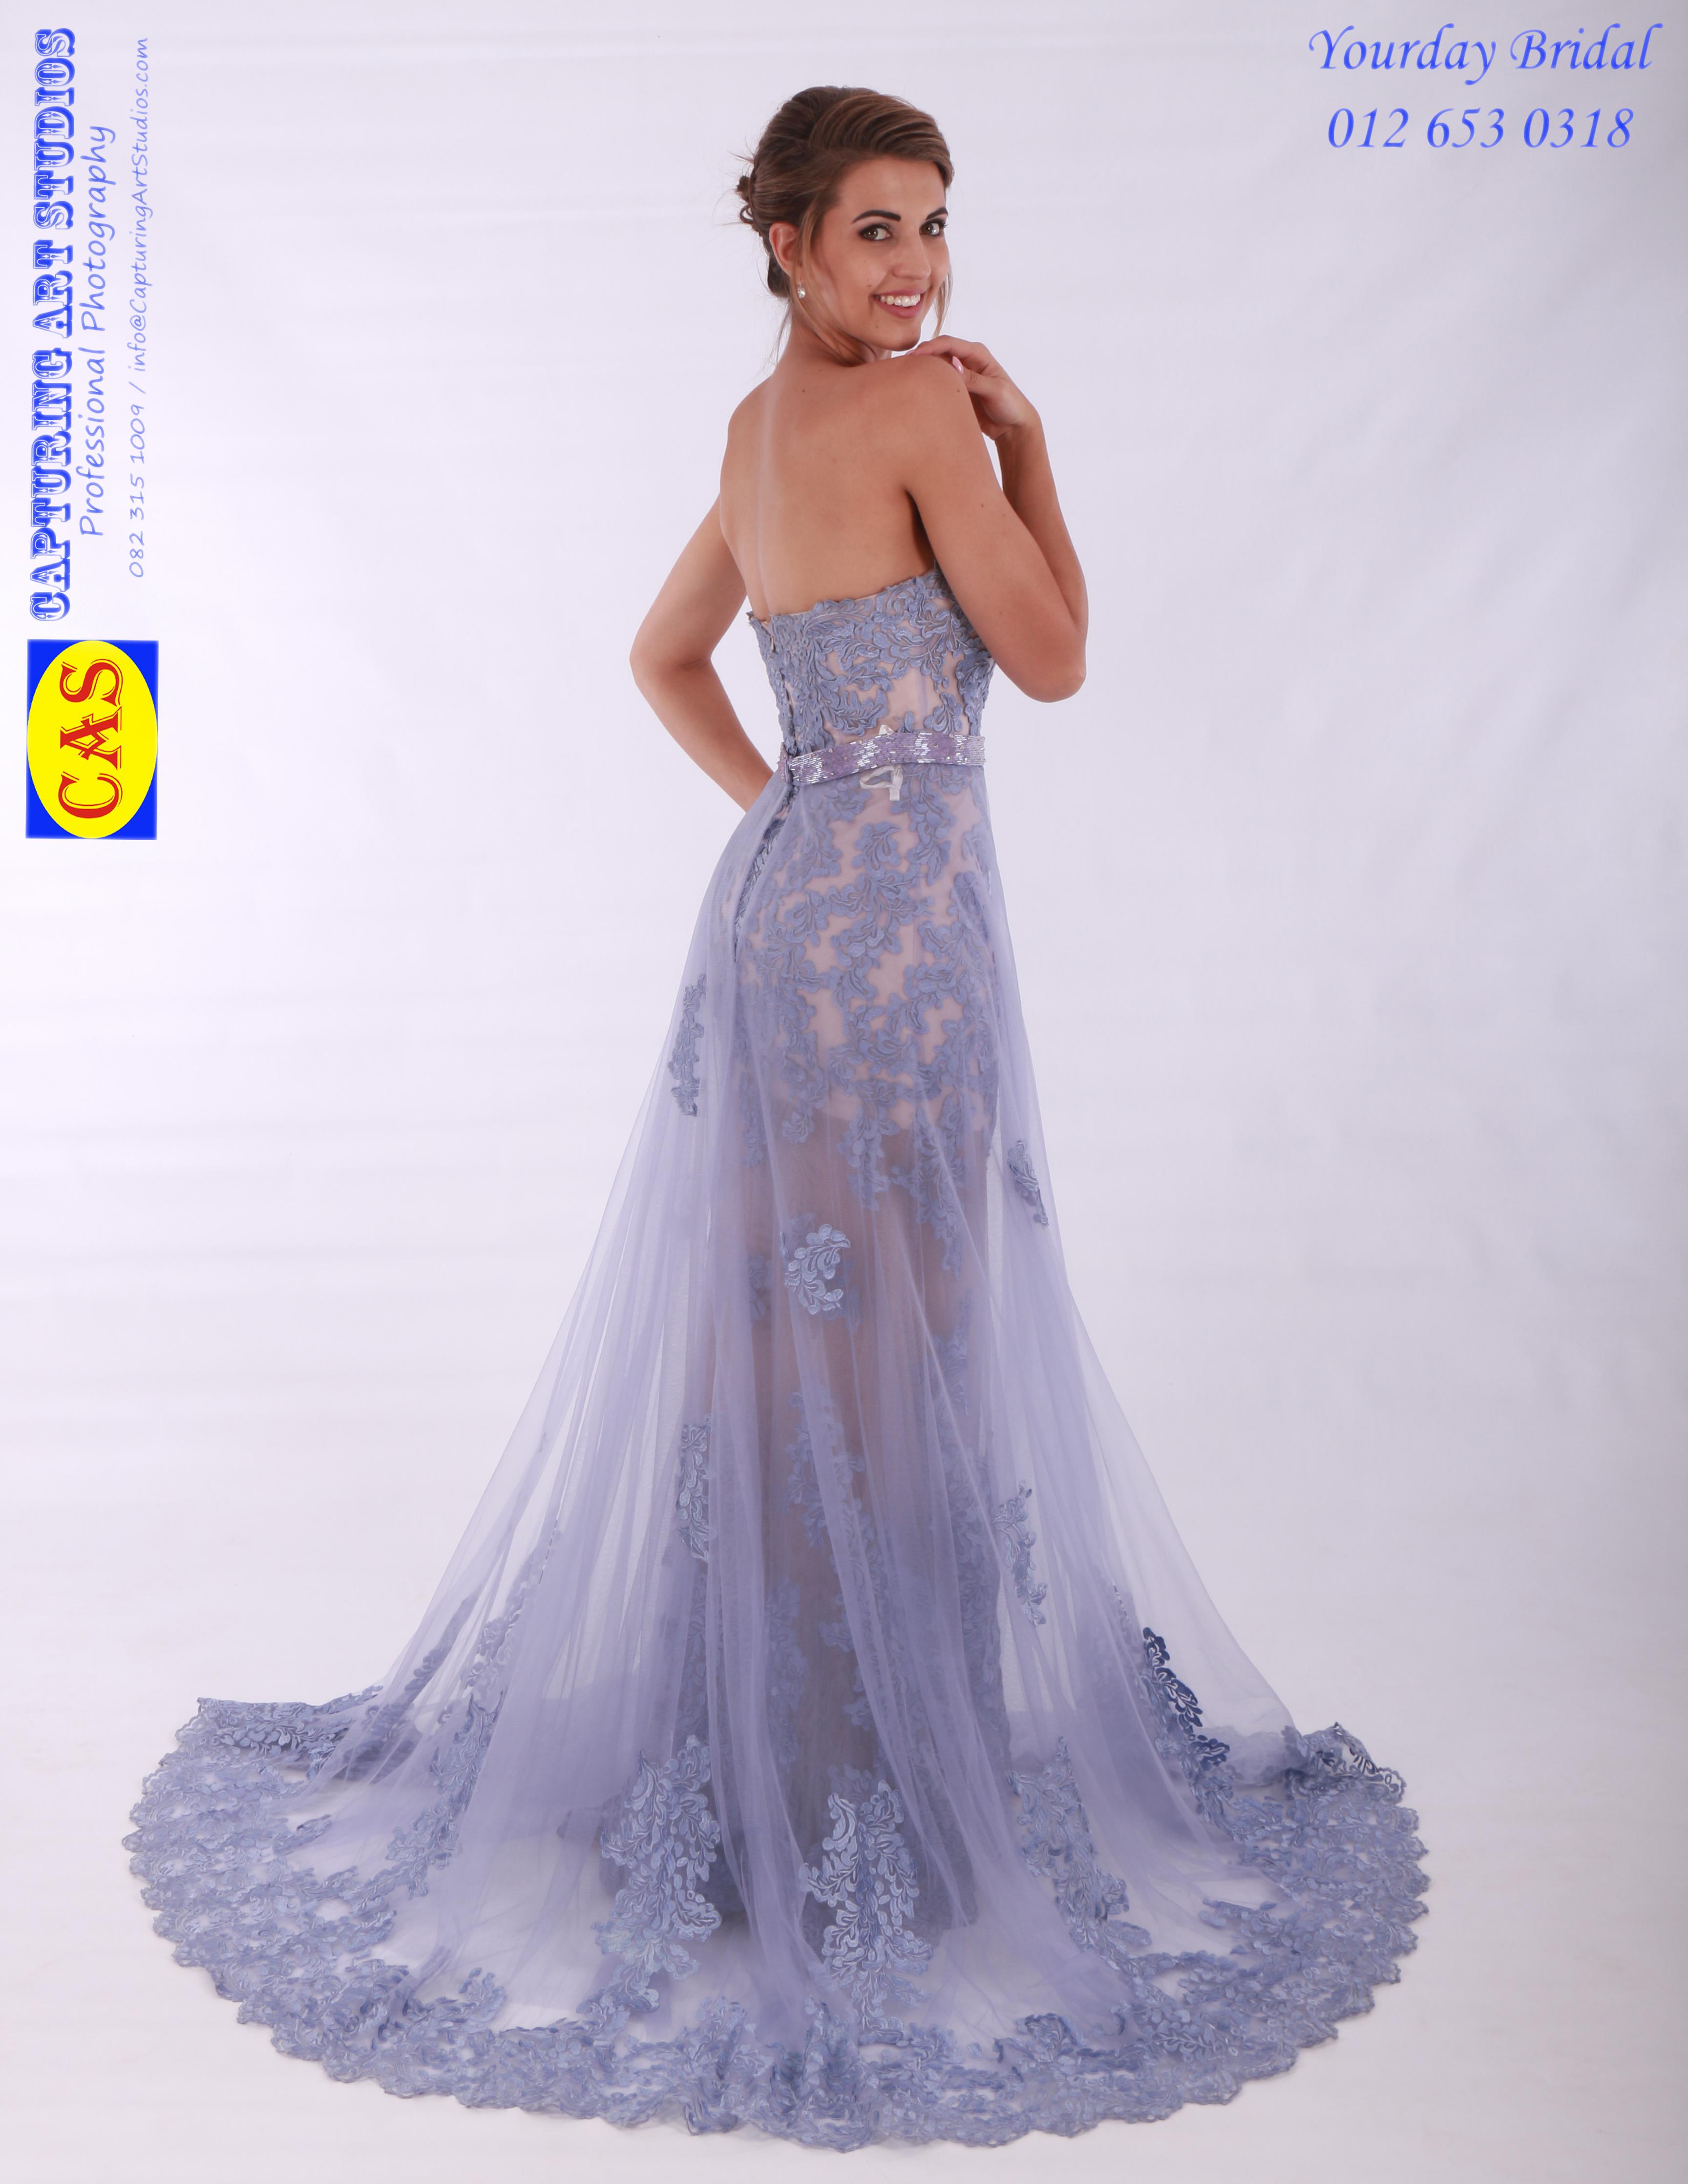 c7ae585773 Cheap Formal Dresses In Pretoria